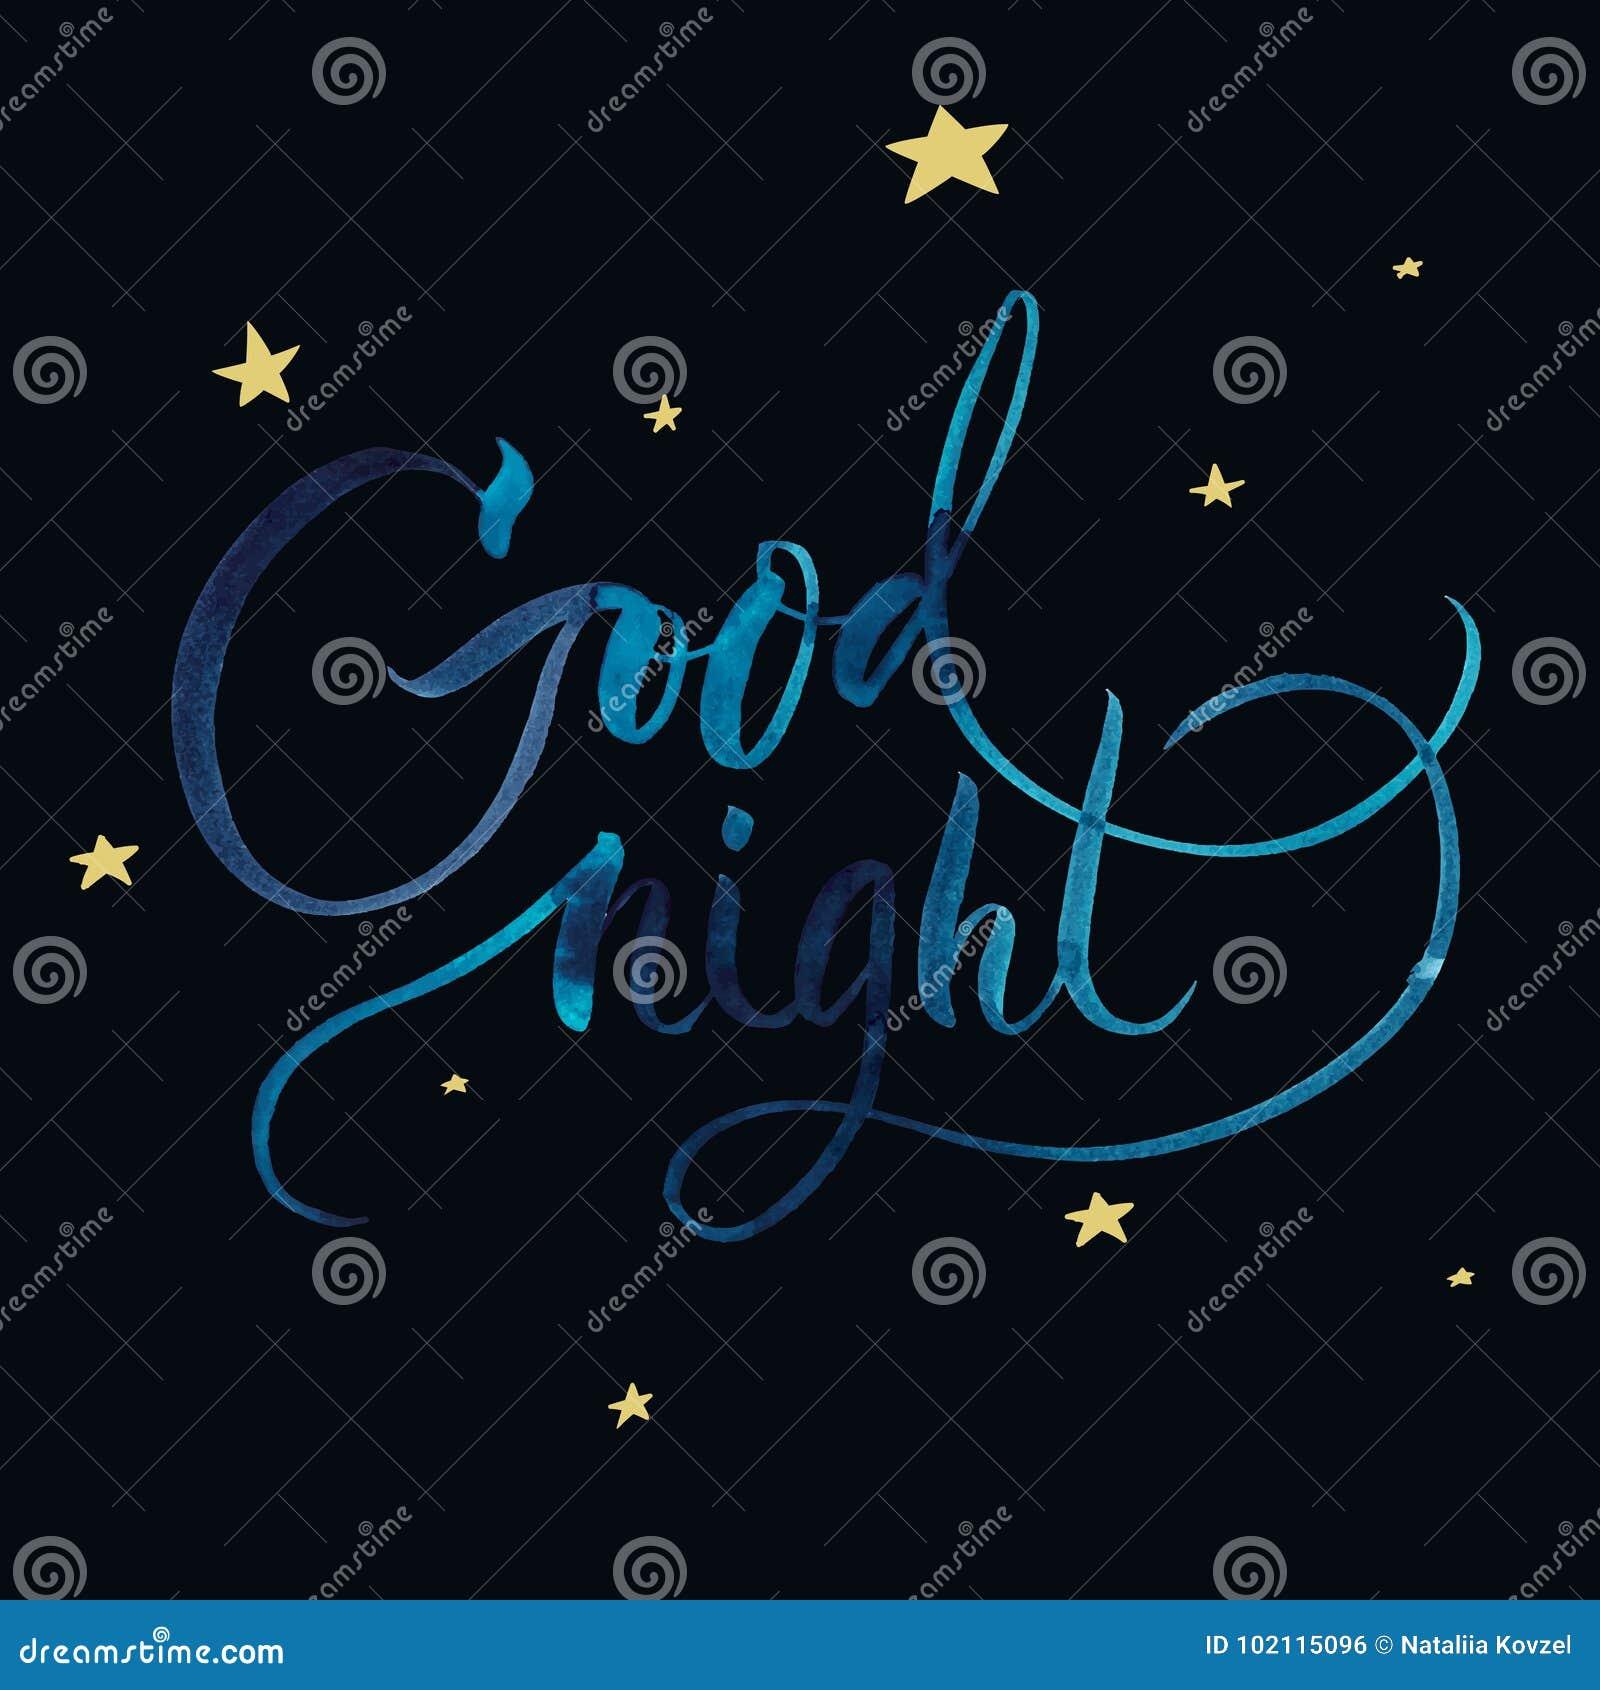 Good Night Handmade Watercolor Brush Lettering For Print Card